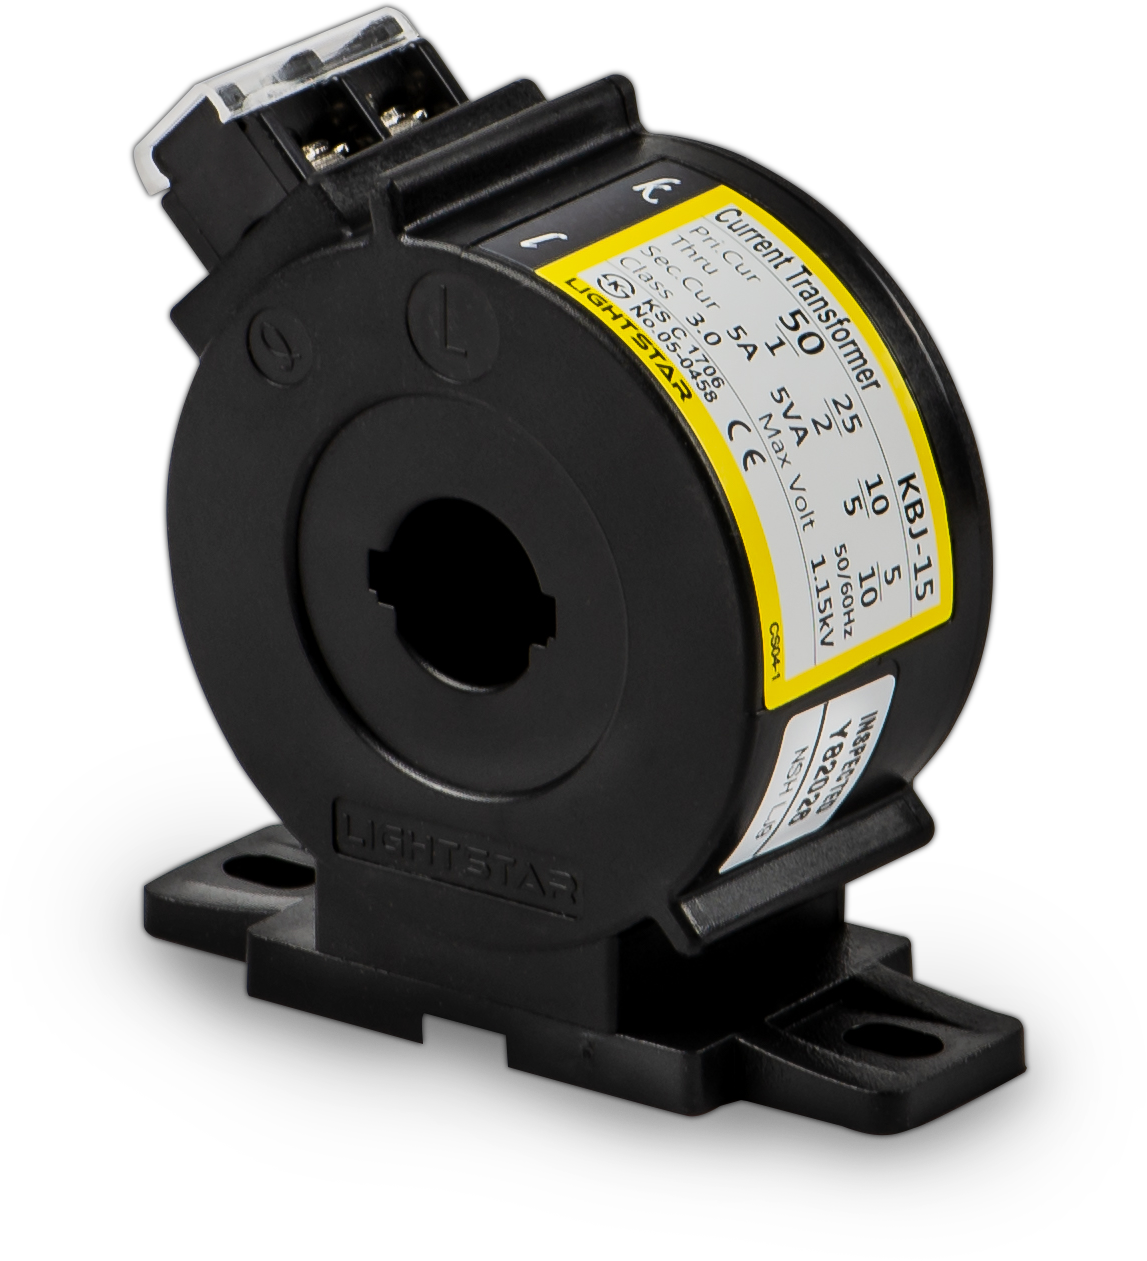 Biến dòng đo lường KBJ-15 (50/5A60/5A,75/5A,100/5A,120/5A,150/5A